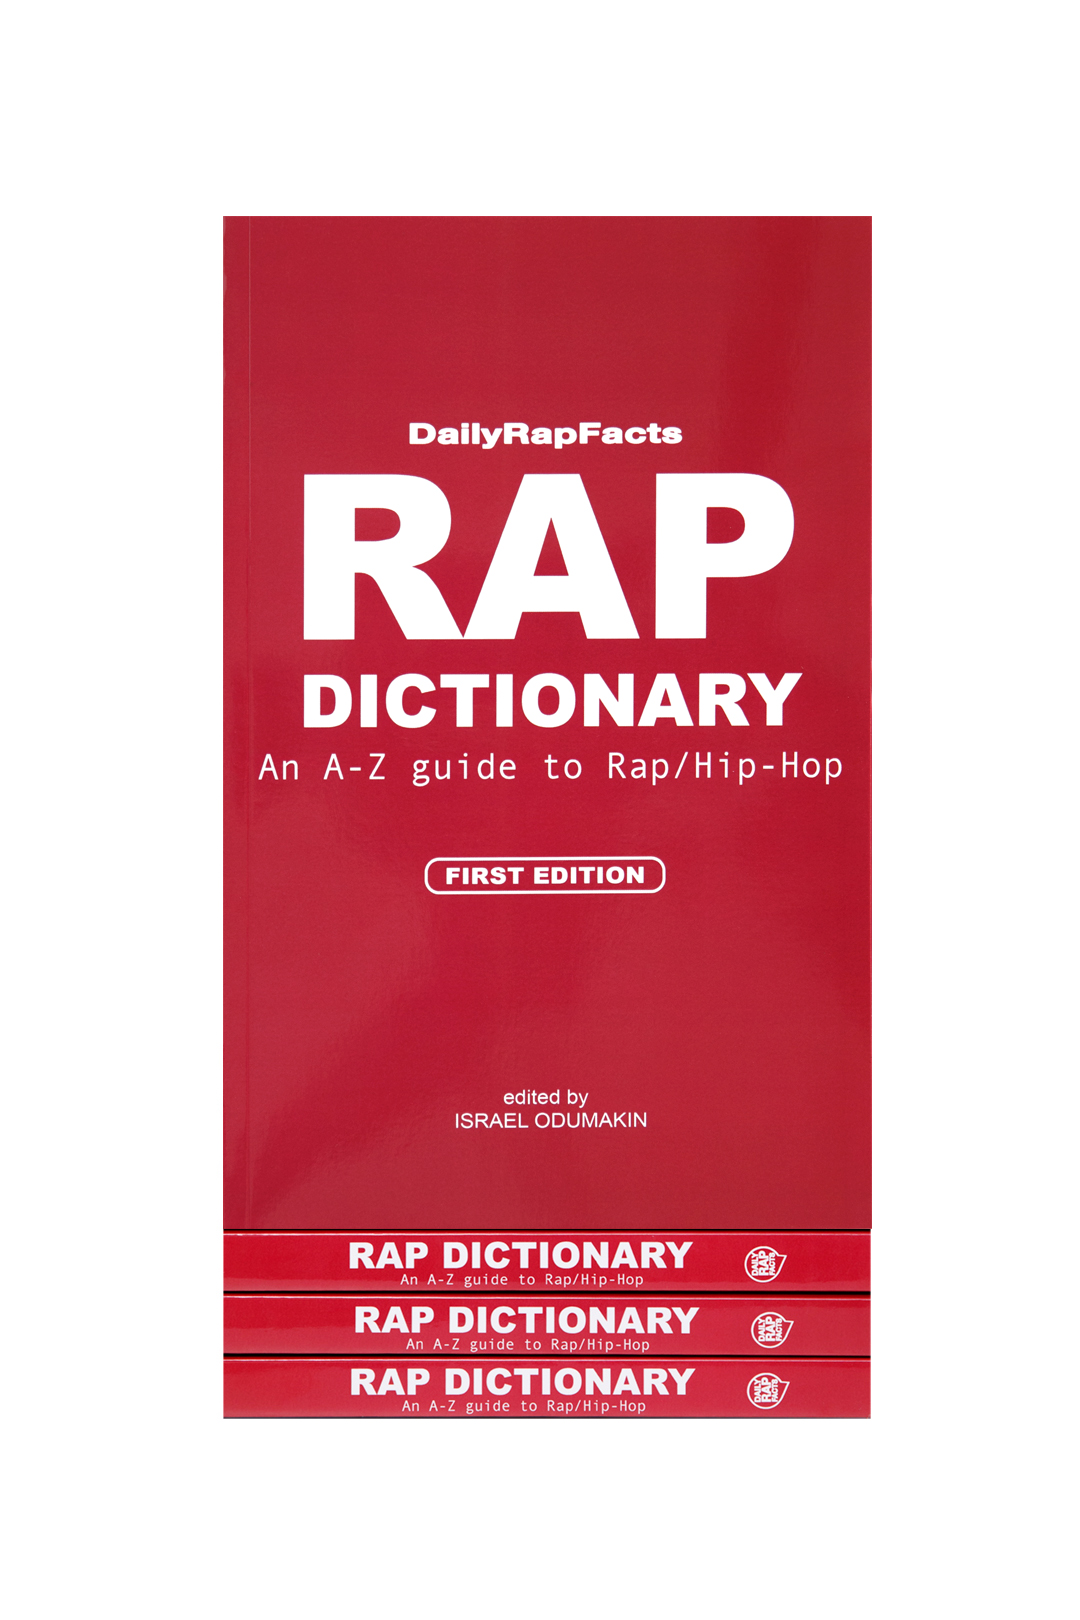 Rap Dictionaries